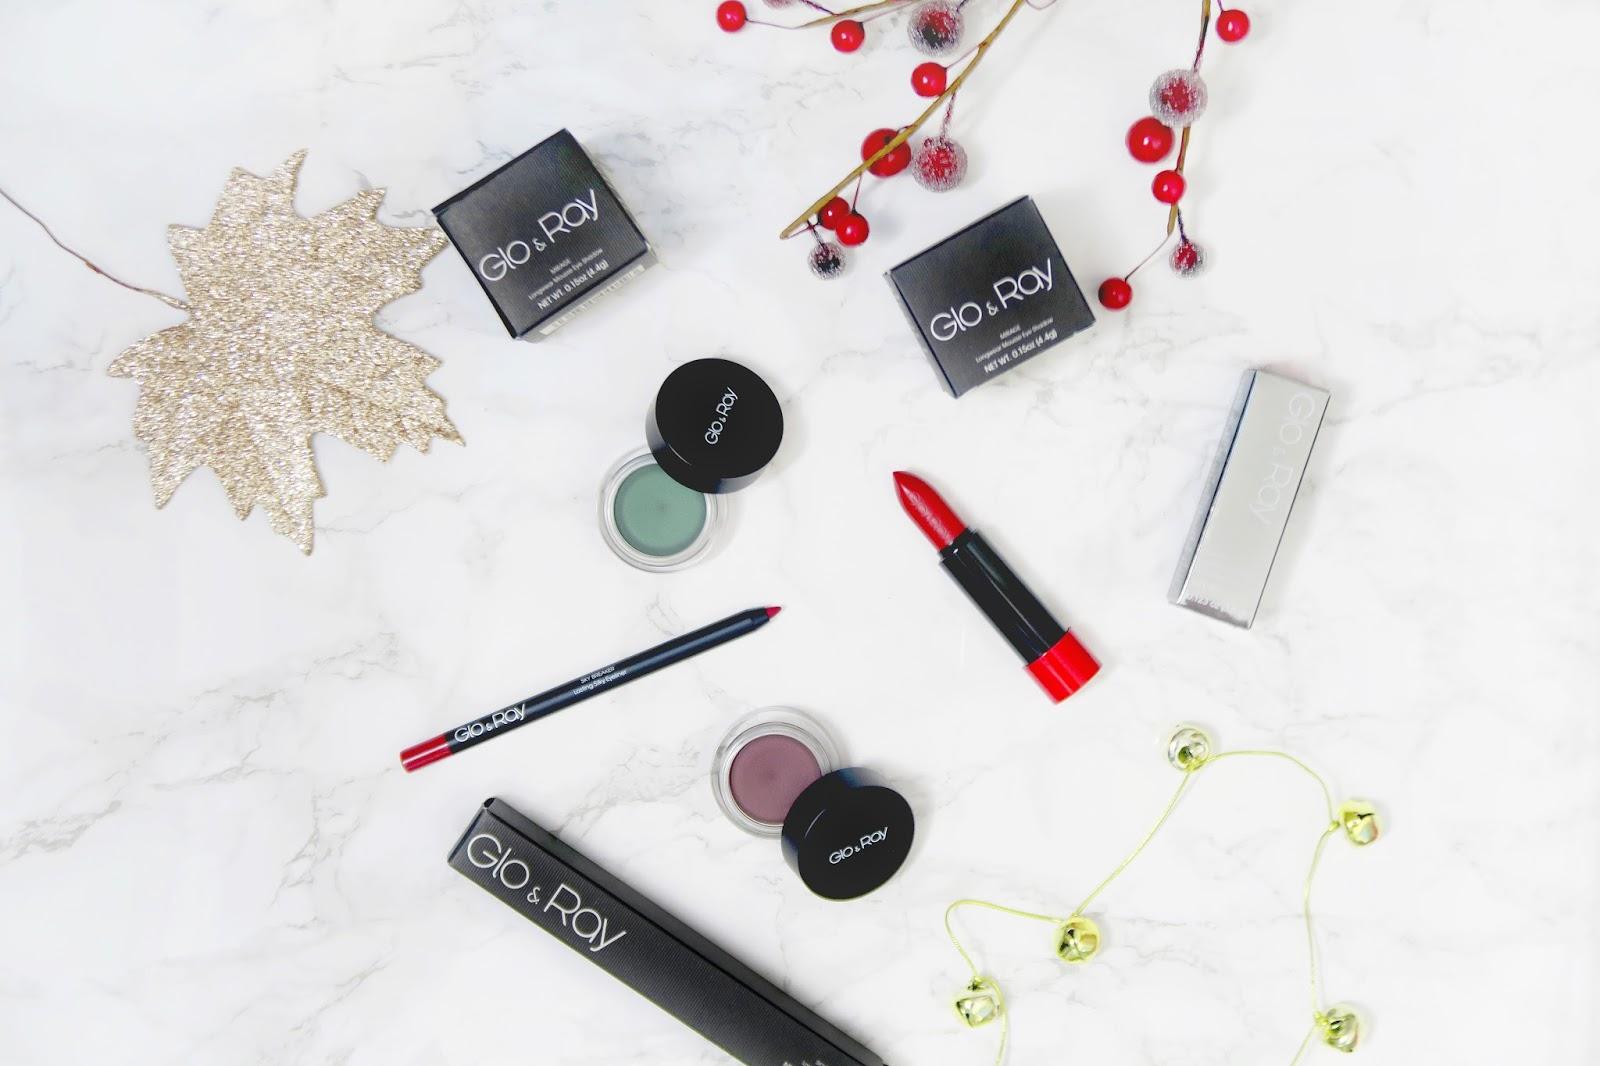 An image of Glo & Ray AW16 makeup